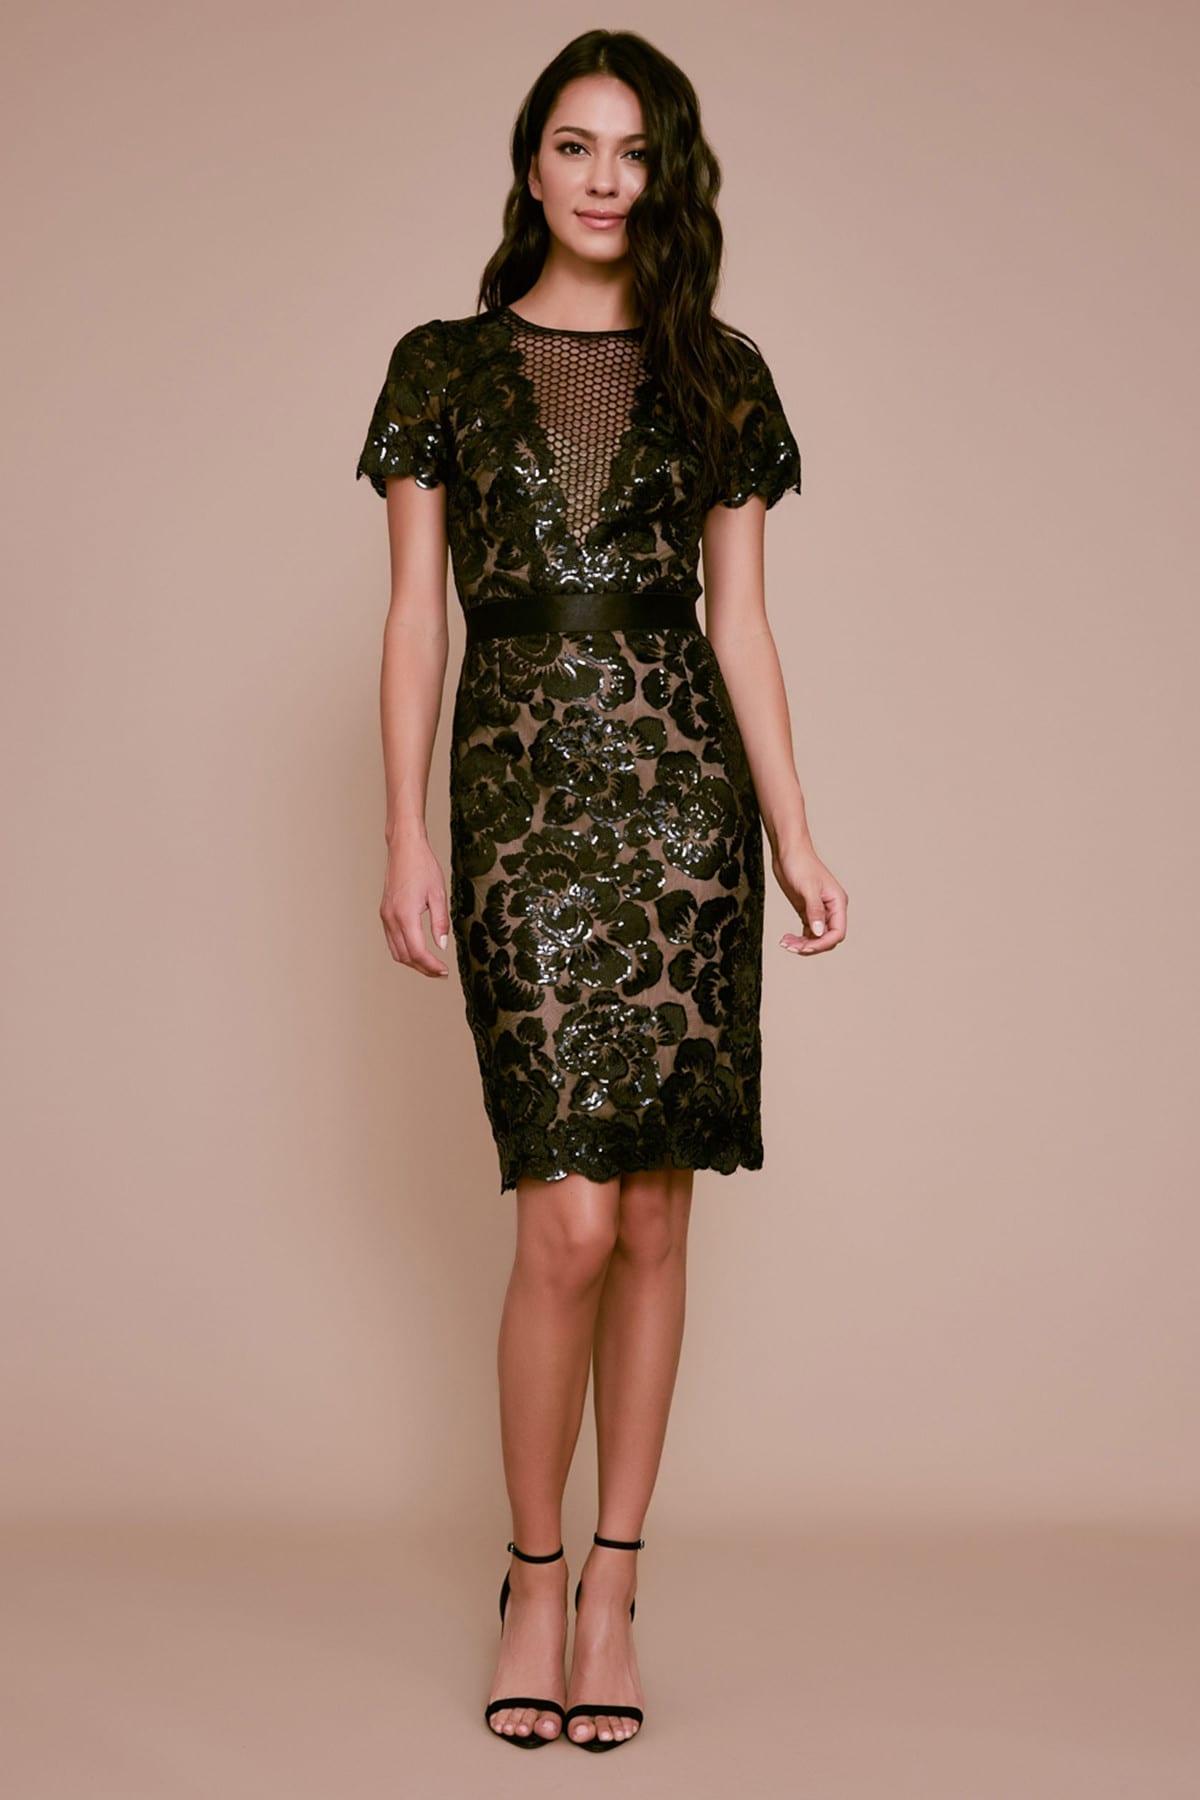 TADASHI SHOJI Riel Floral Sequin Embroidered Dress